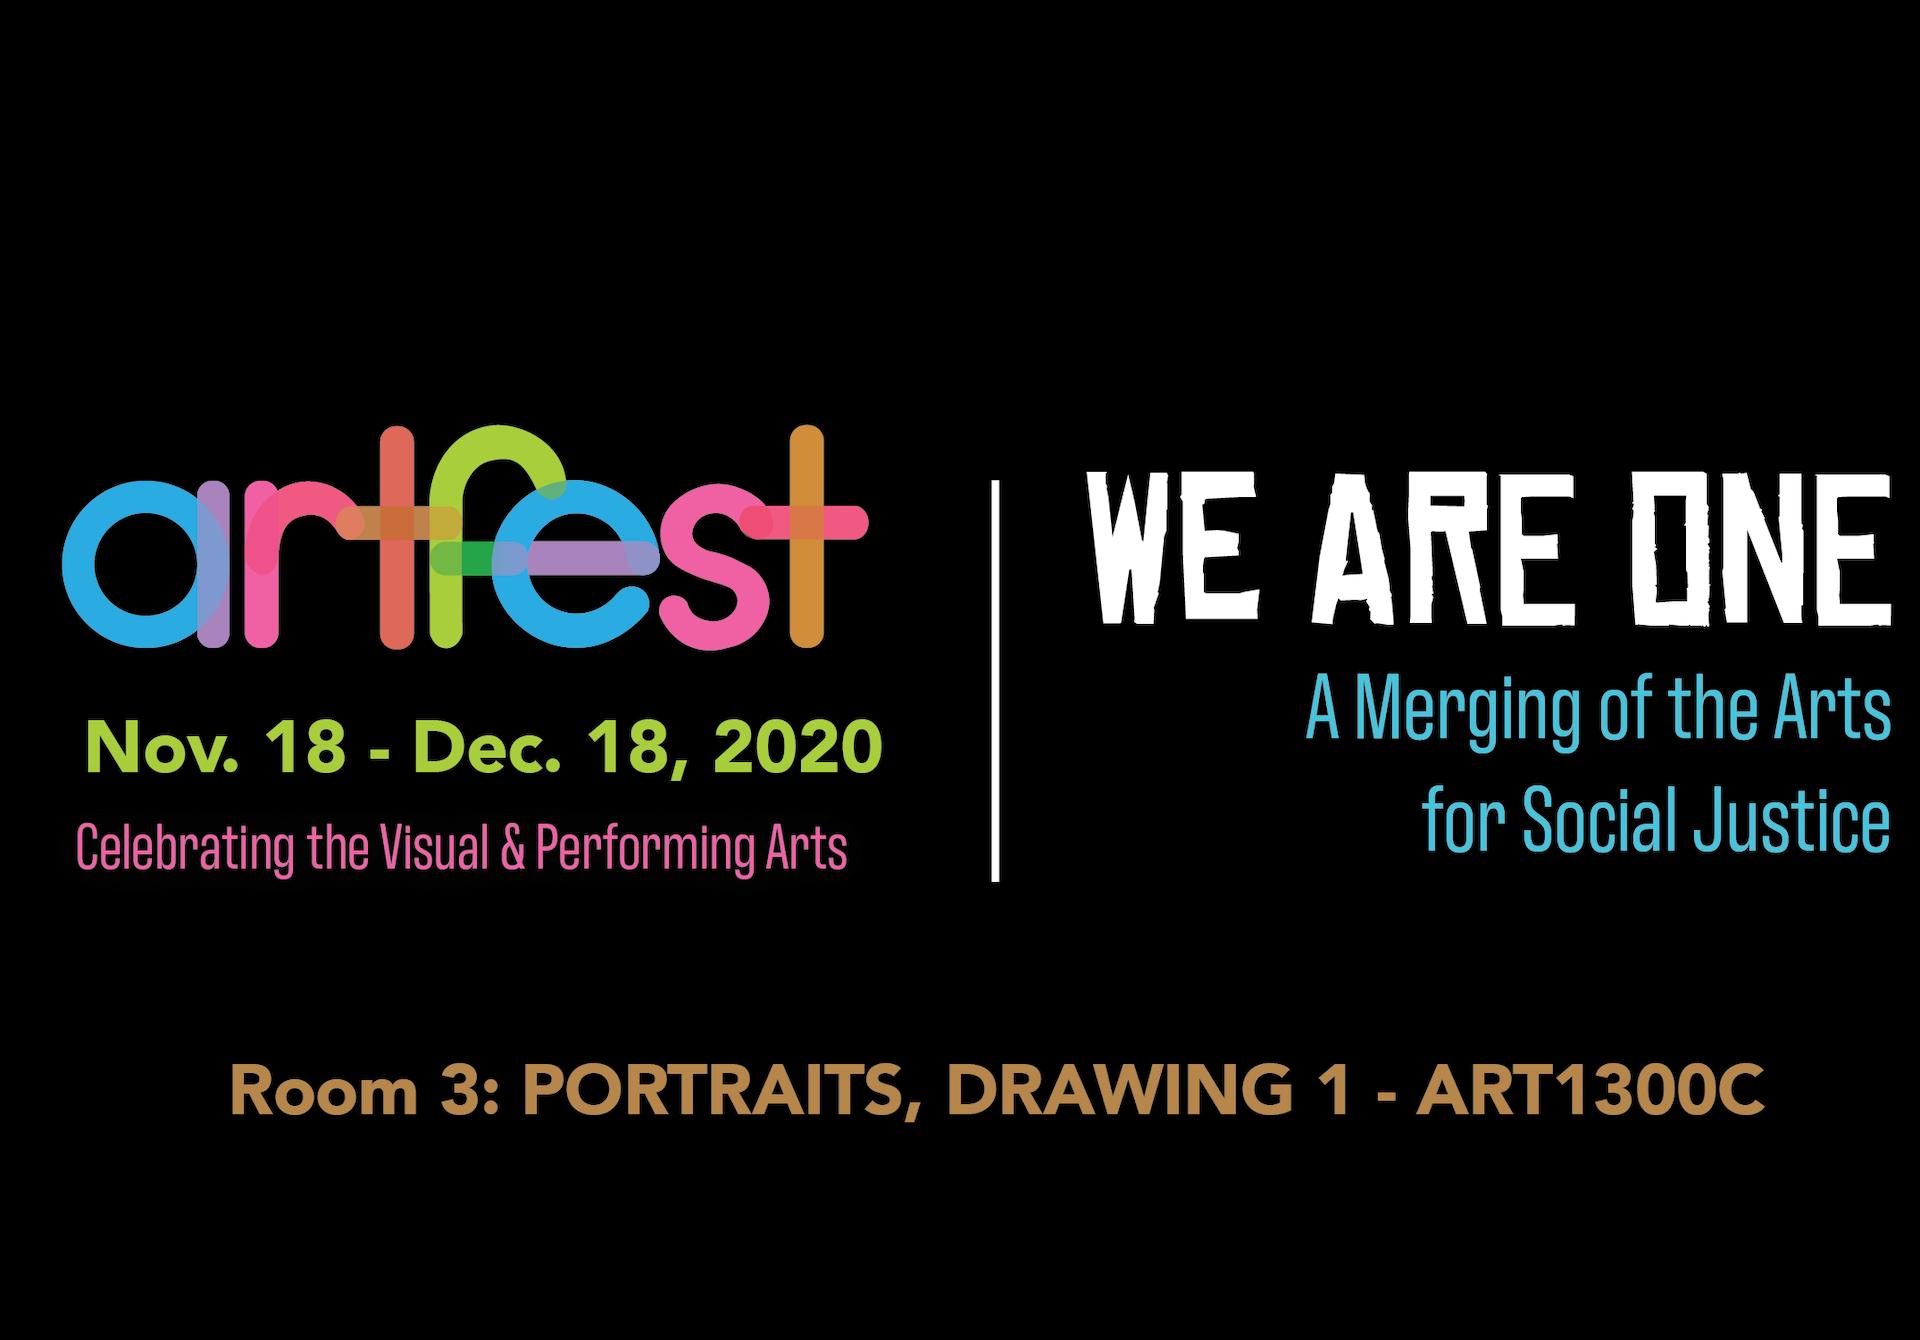 artfest exhibit banner drawing 1 portraits.png